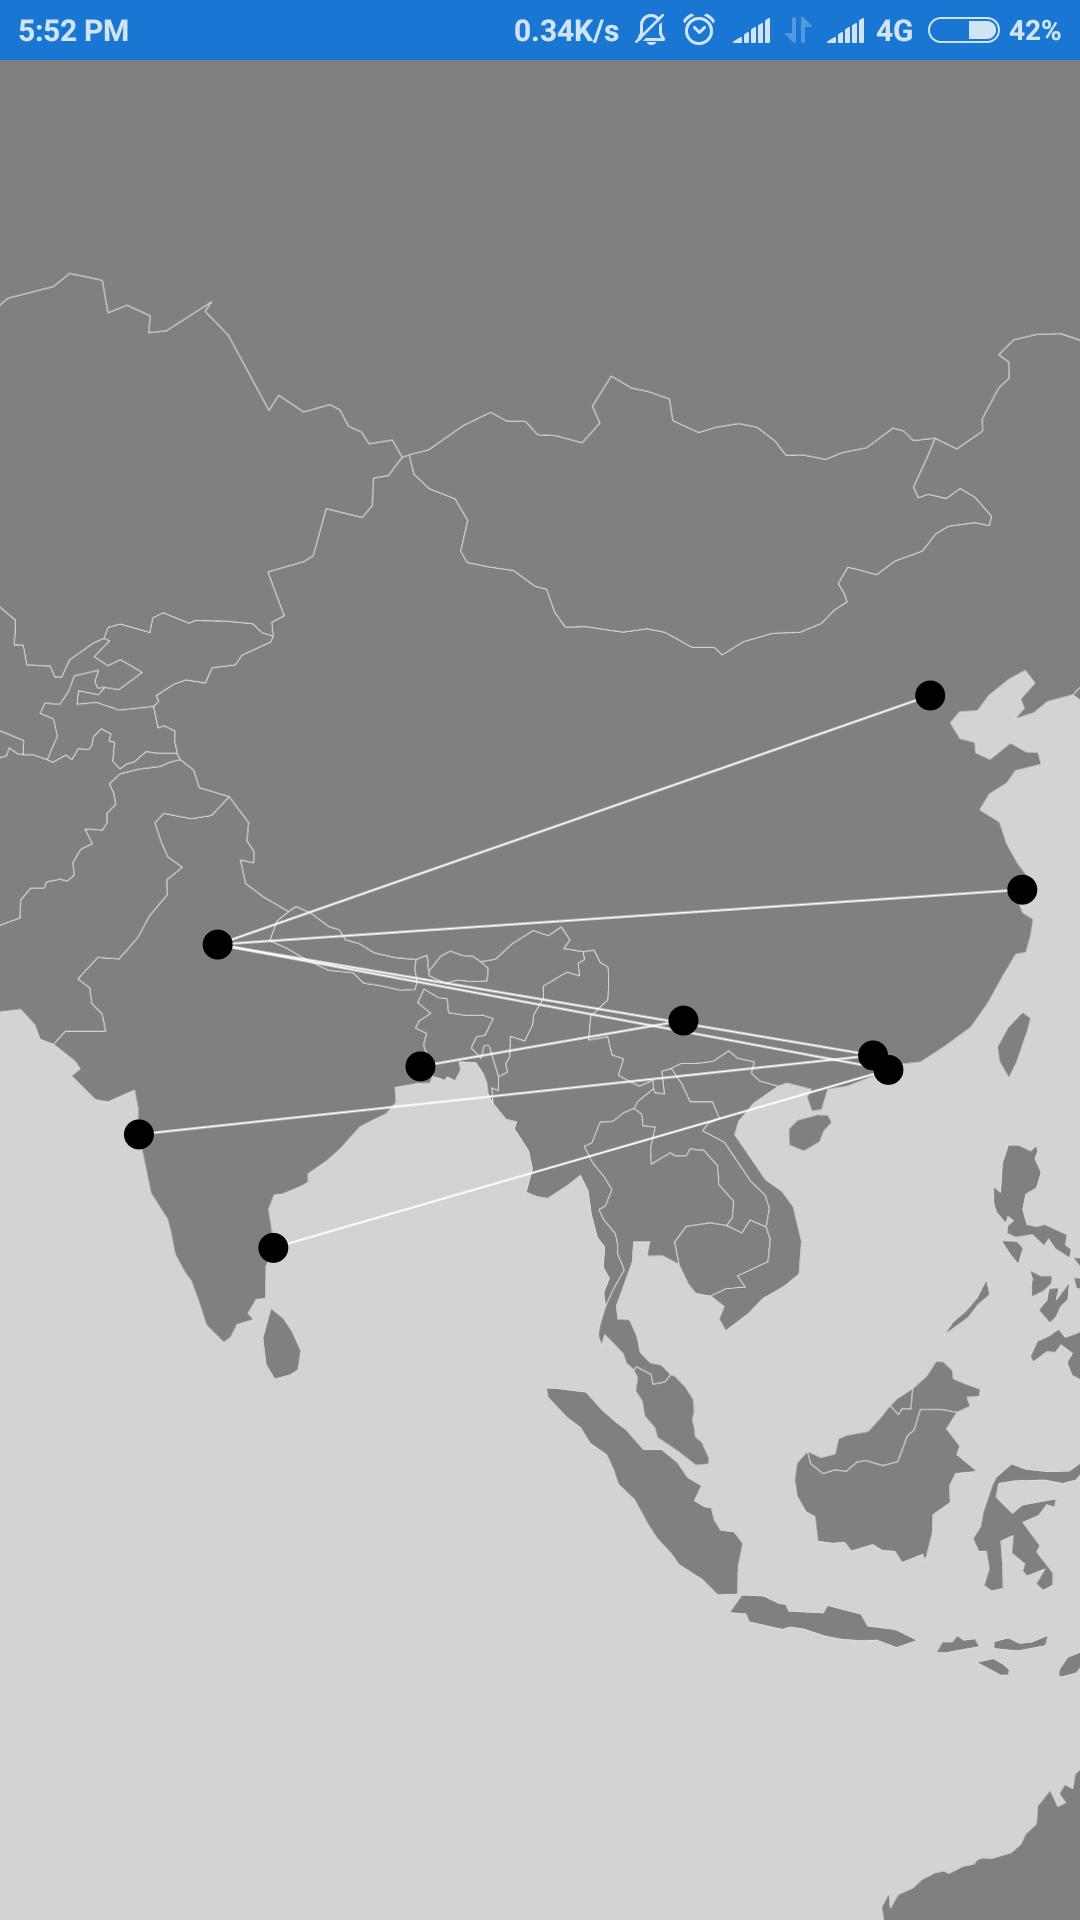 Lines between two terminals using xamarin SfMaps